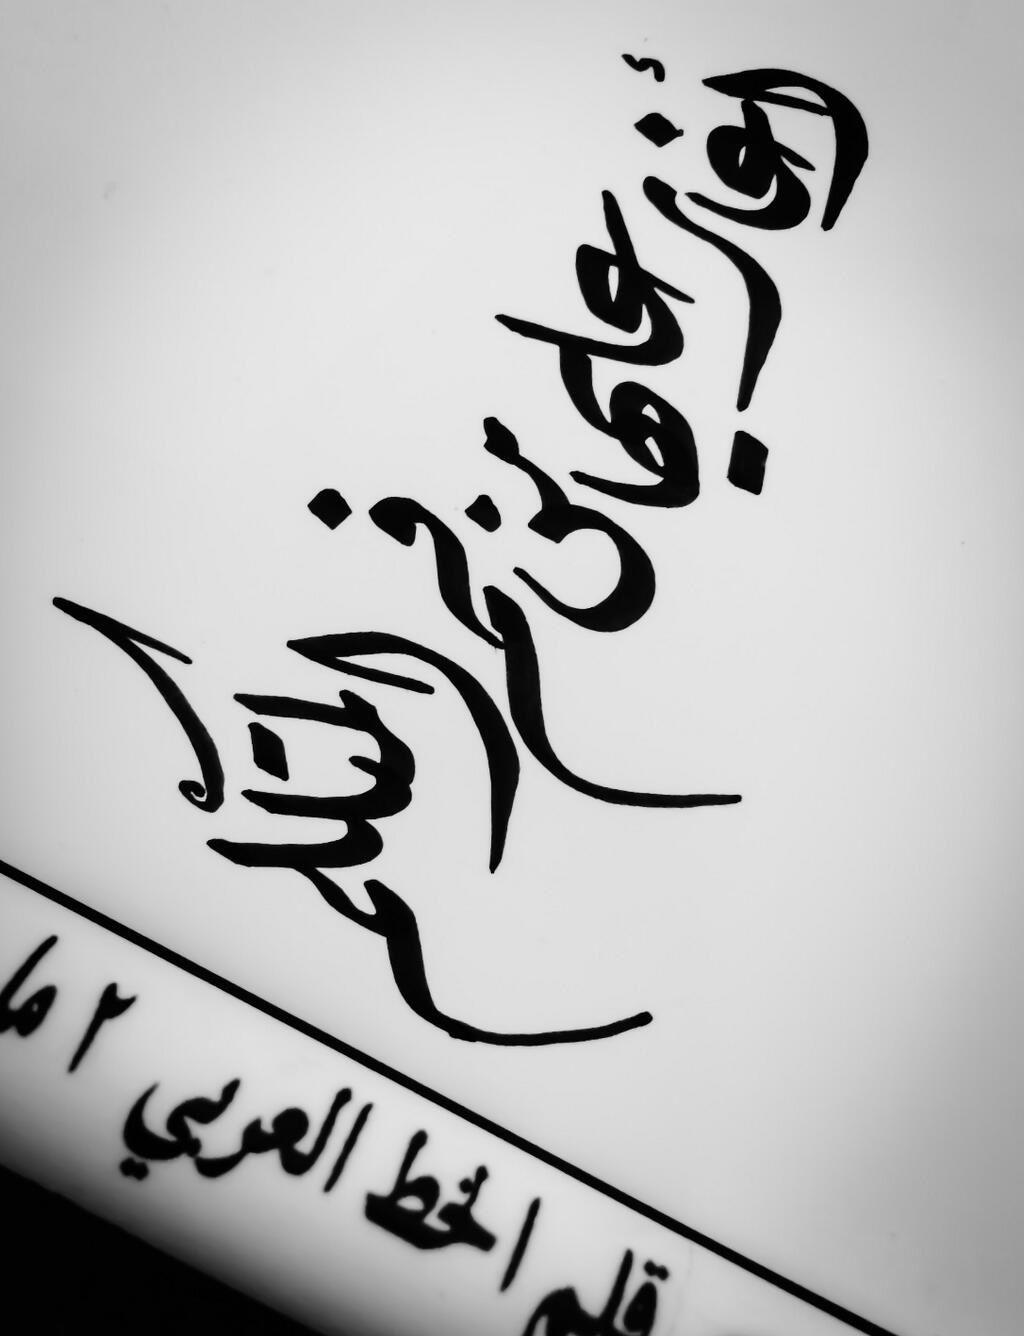 أغار عليها Words Quotes Words Arabic Words